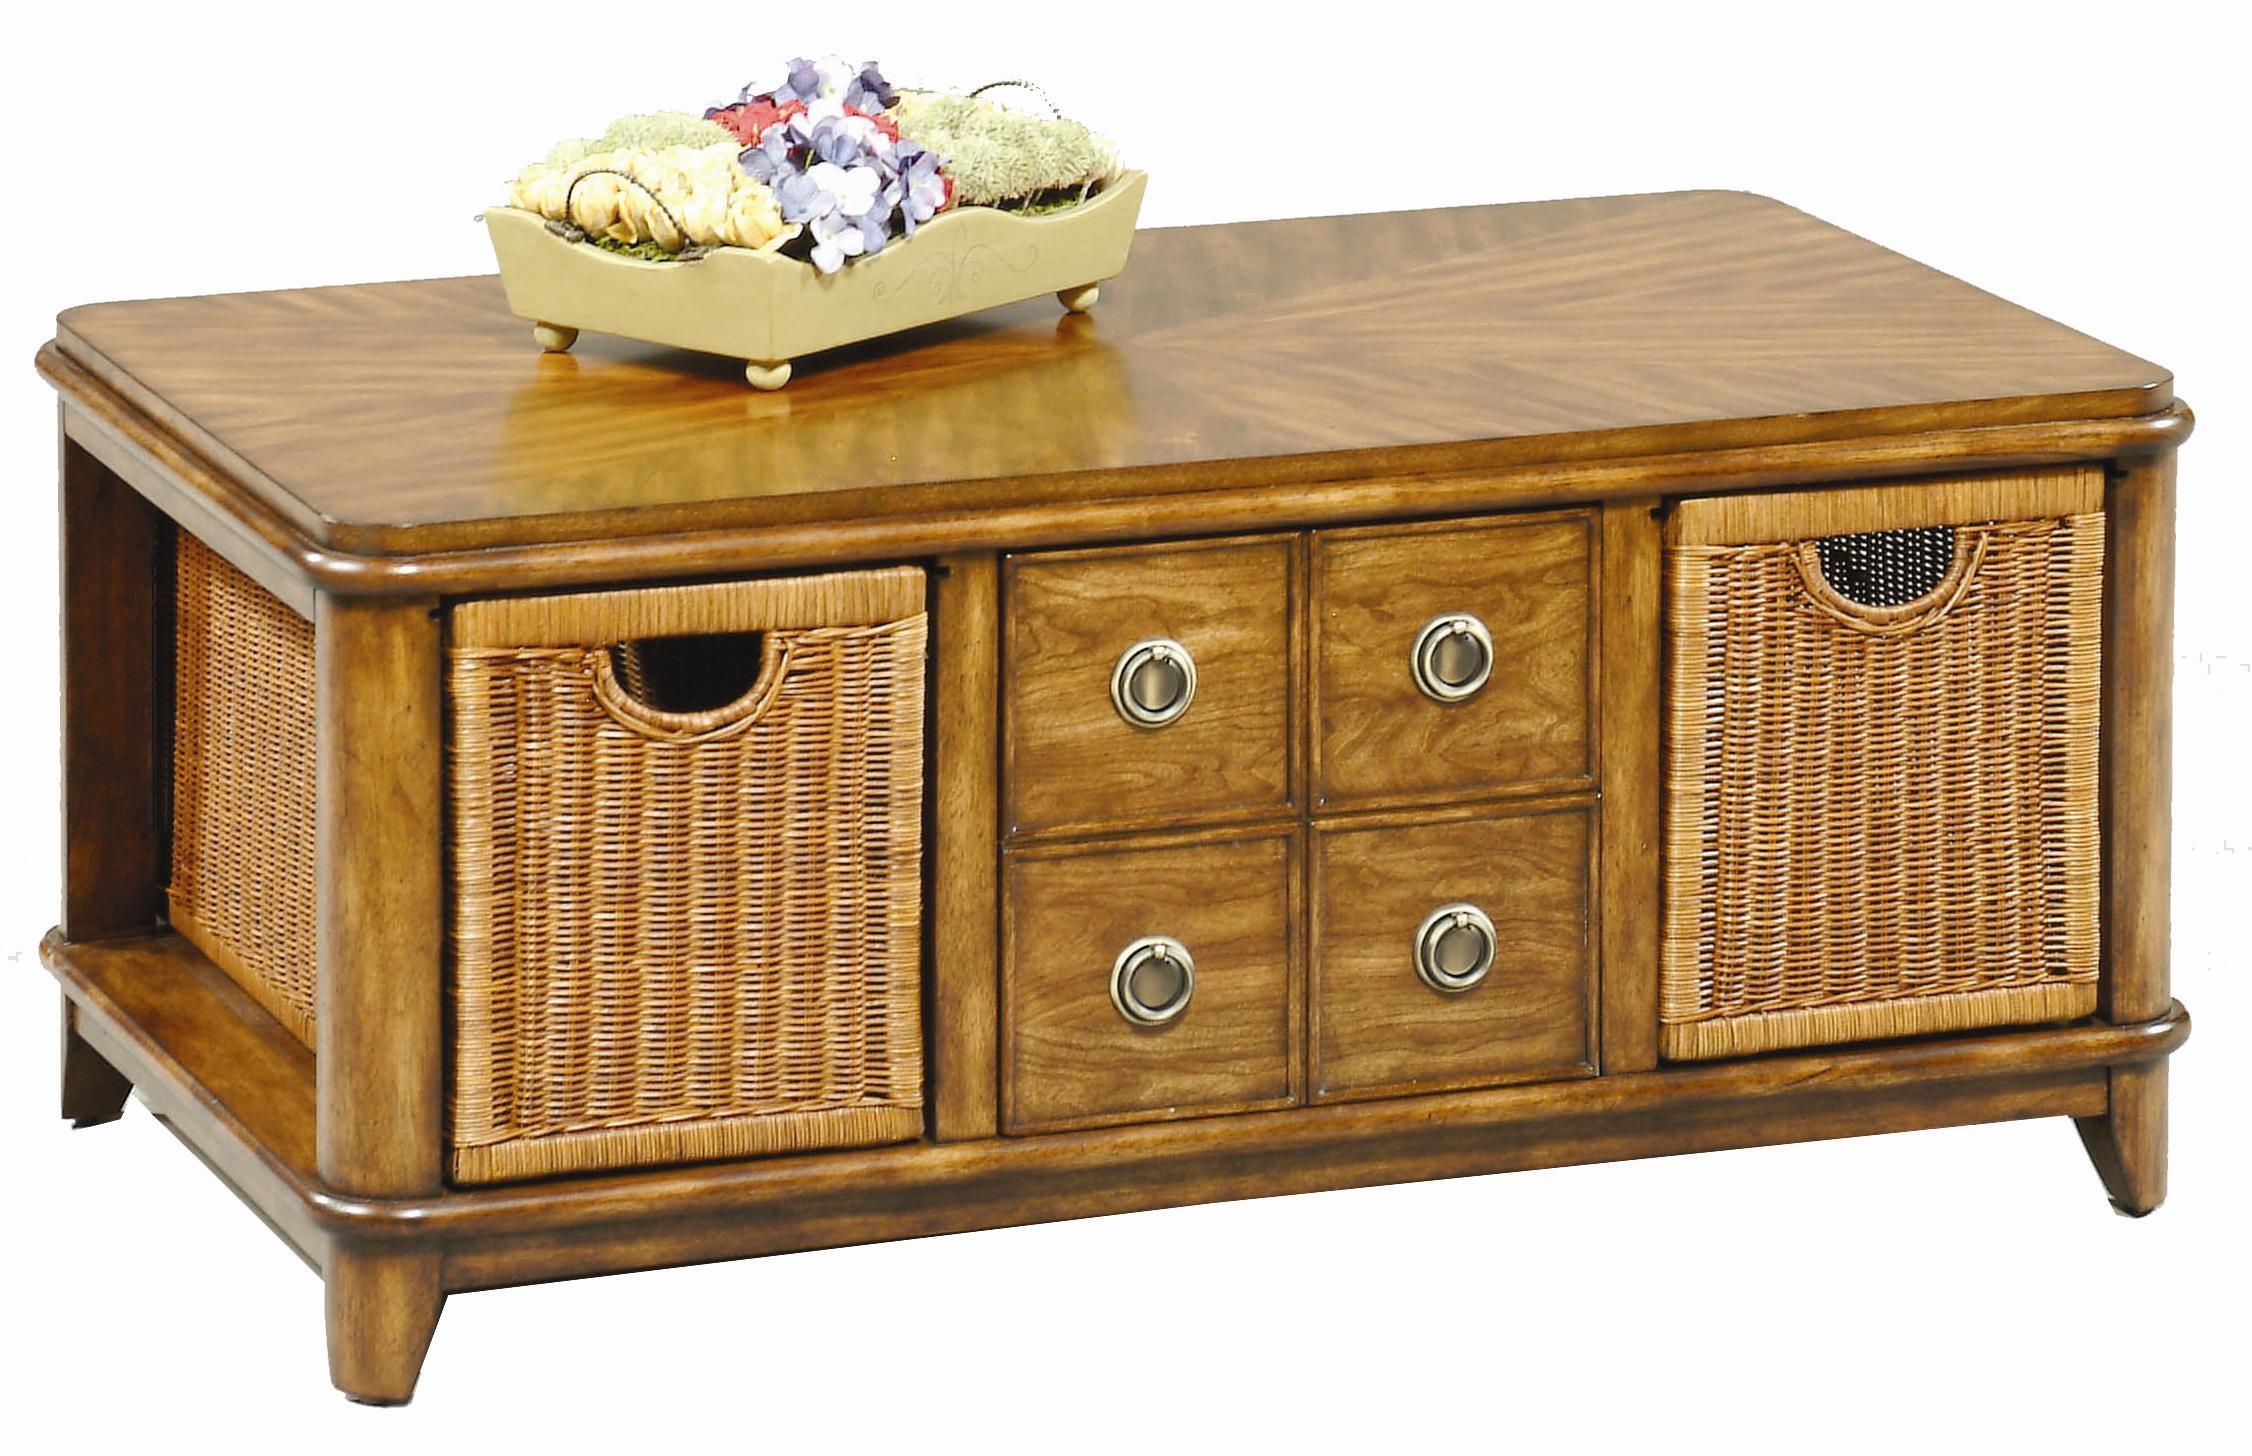 Progressive Furniture Anaronda Rectangular Cocktail Table - Item Number: 533-01